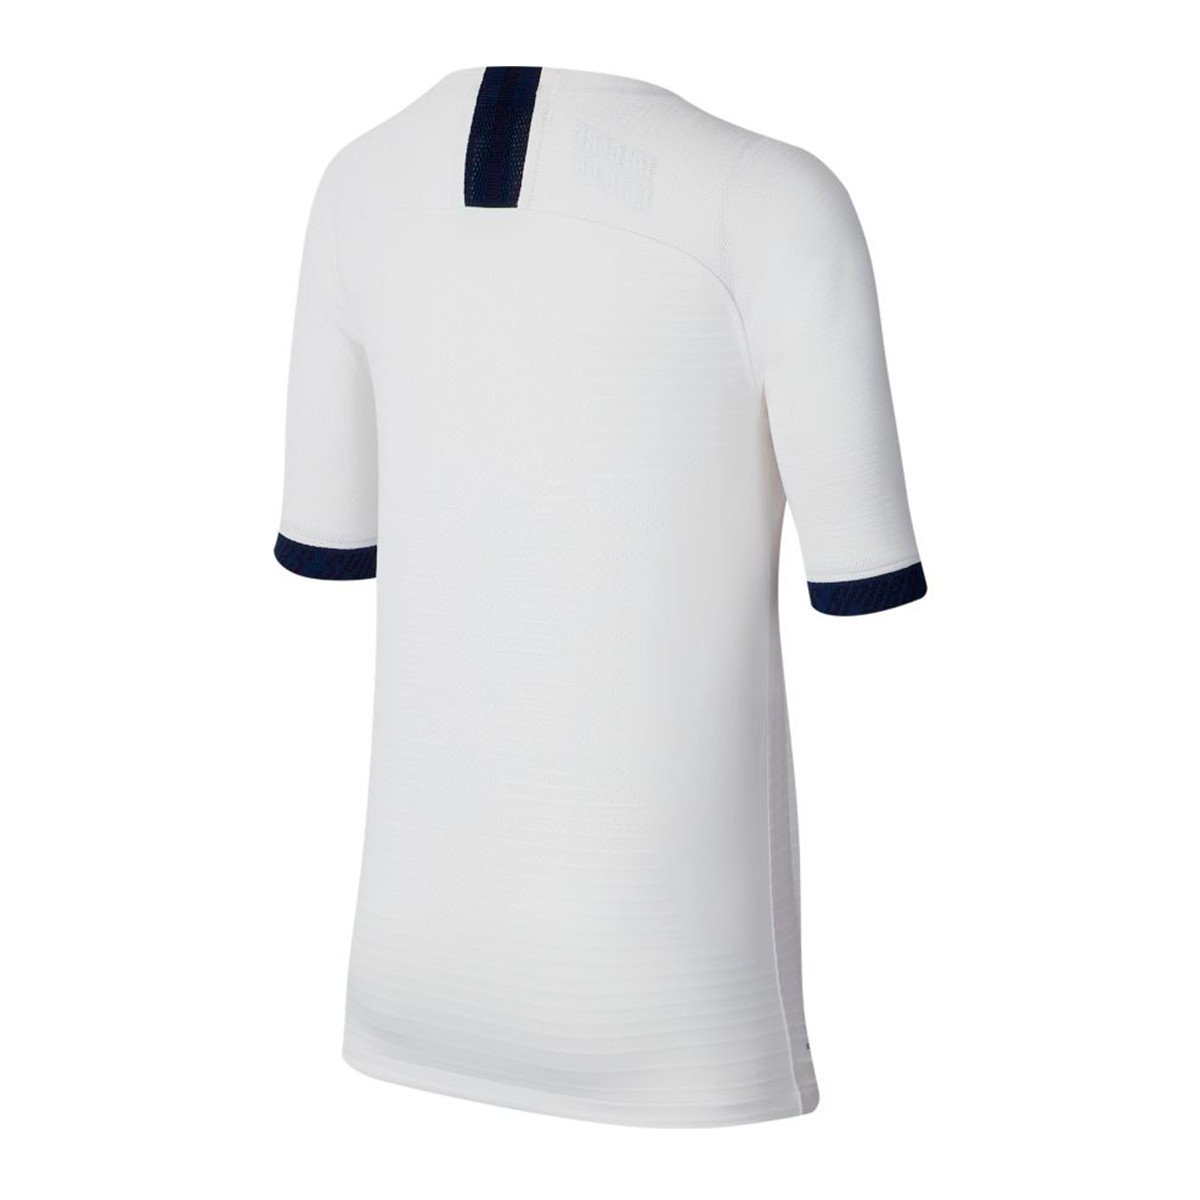 Jersey Nike Kids Tottenham Hotspur Vapor Match 2019 2020 Home White Binary Blue Football Store Futbol Emotion